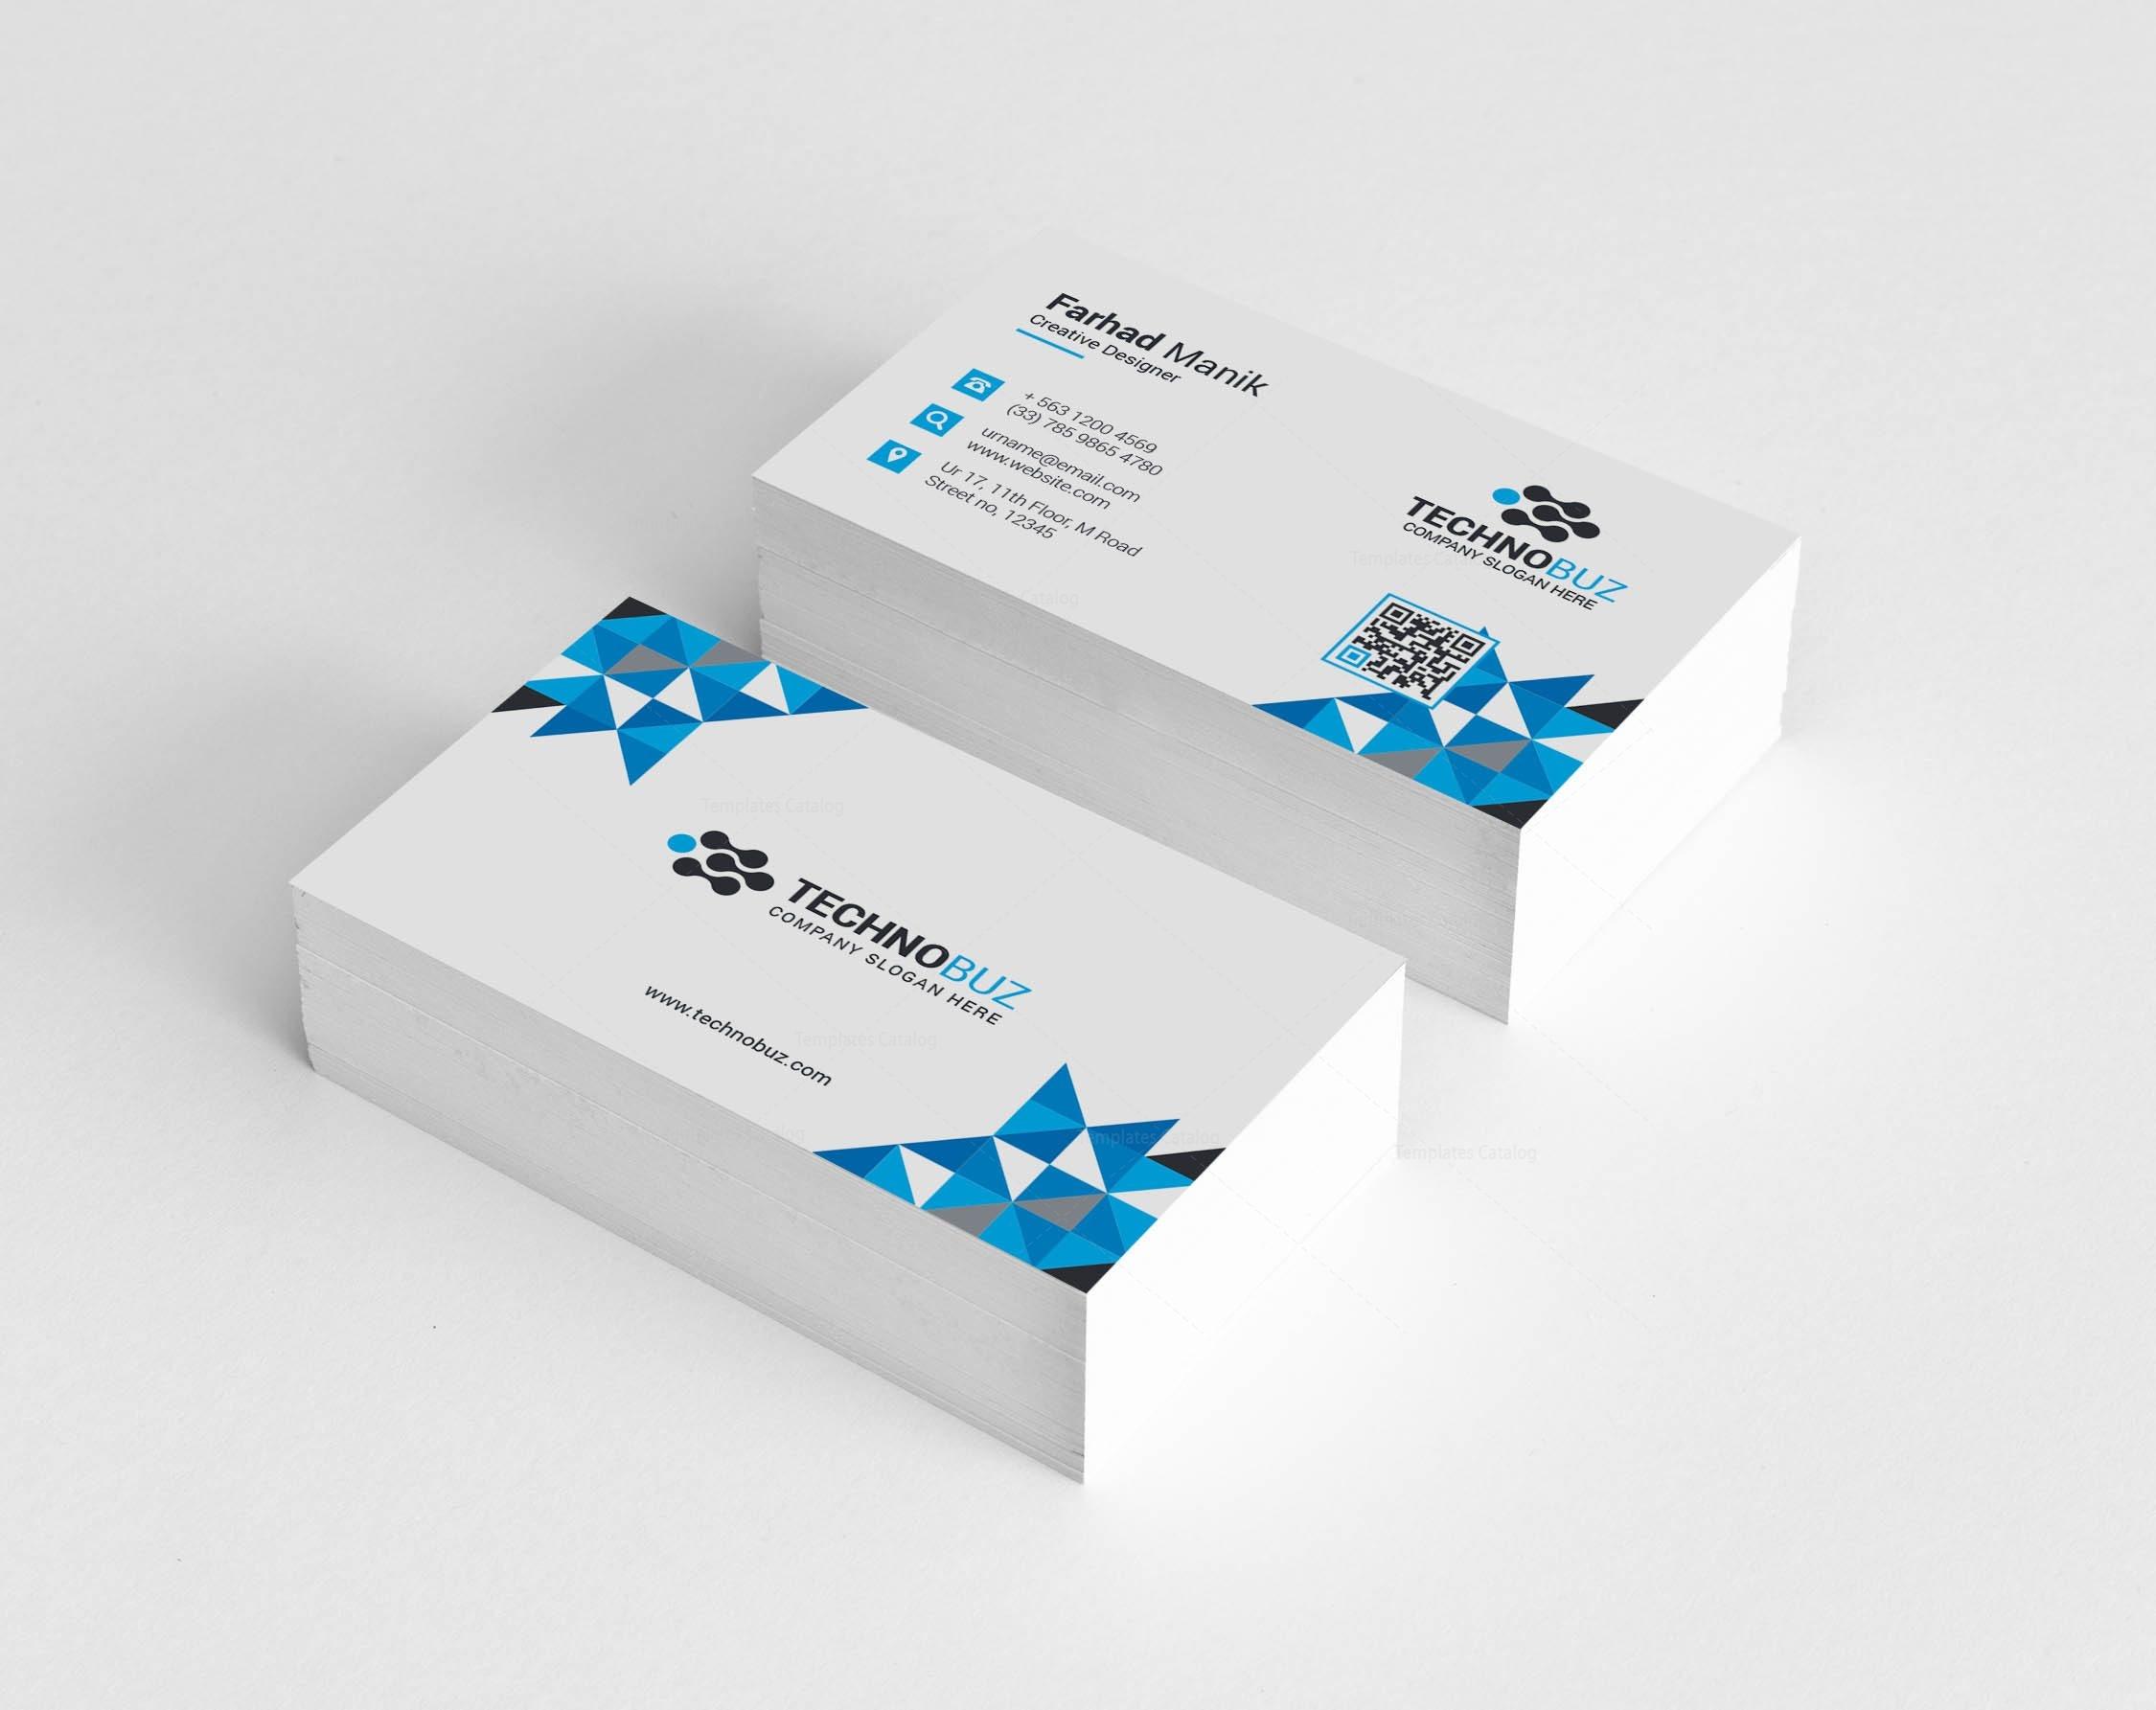 Hesperus creative corporate business card template 001353 template hesperus creative corporate business card template 2 reheart Choice Image